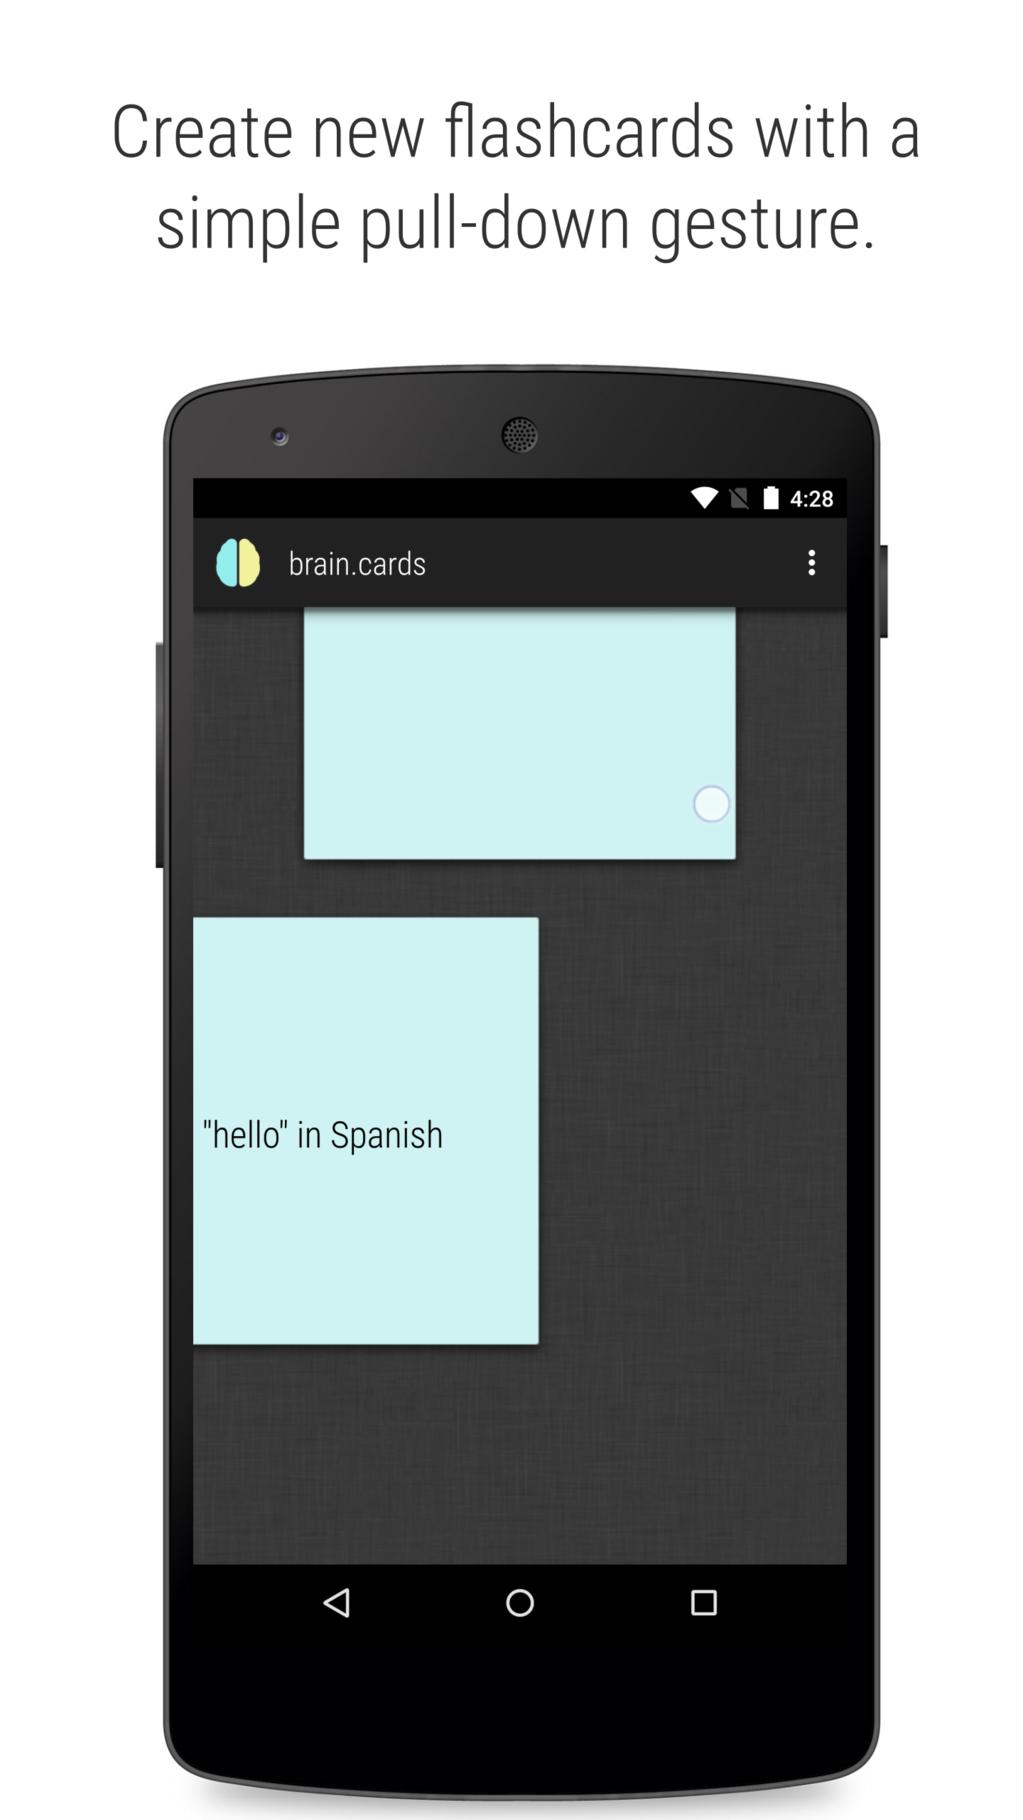 brain.cards flashcards Screenshot 6